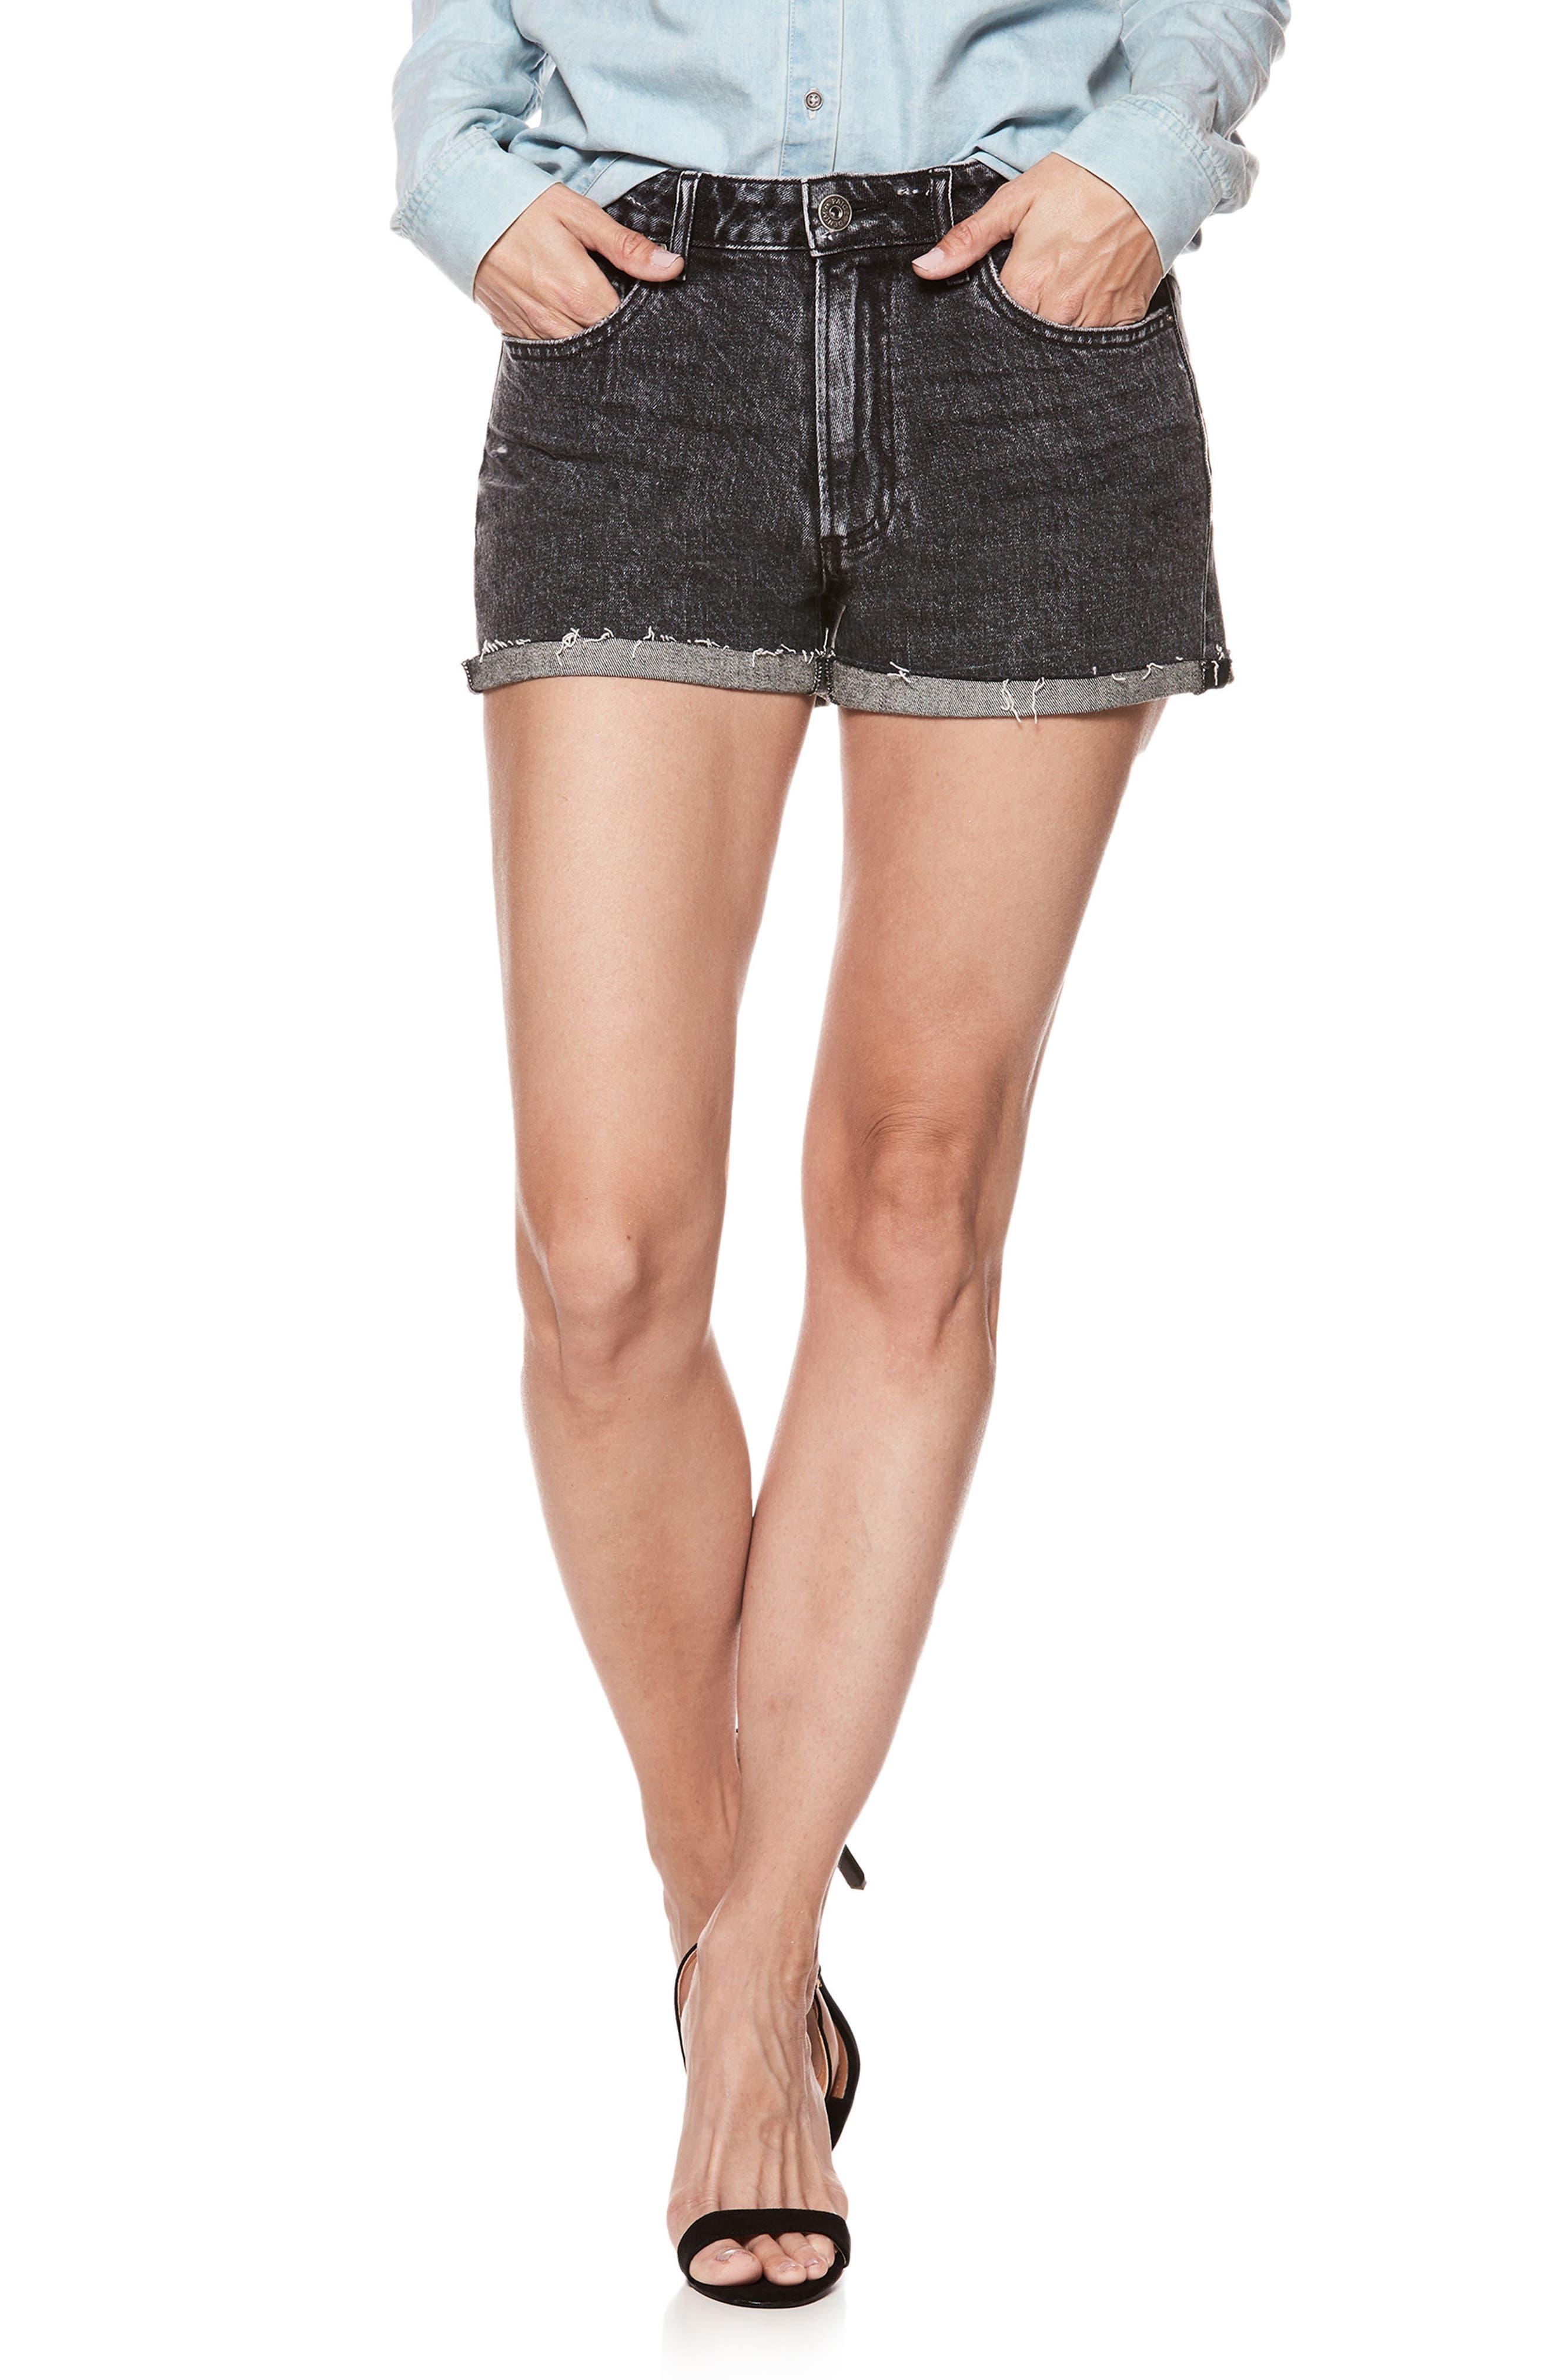 Alternate Image 1 Selected - PAIGE Sarah High Waist Cutoff Denim Shorts (Zephra)